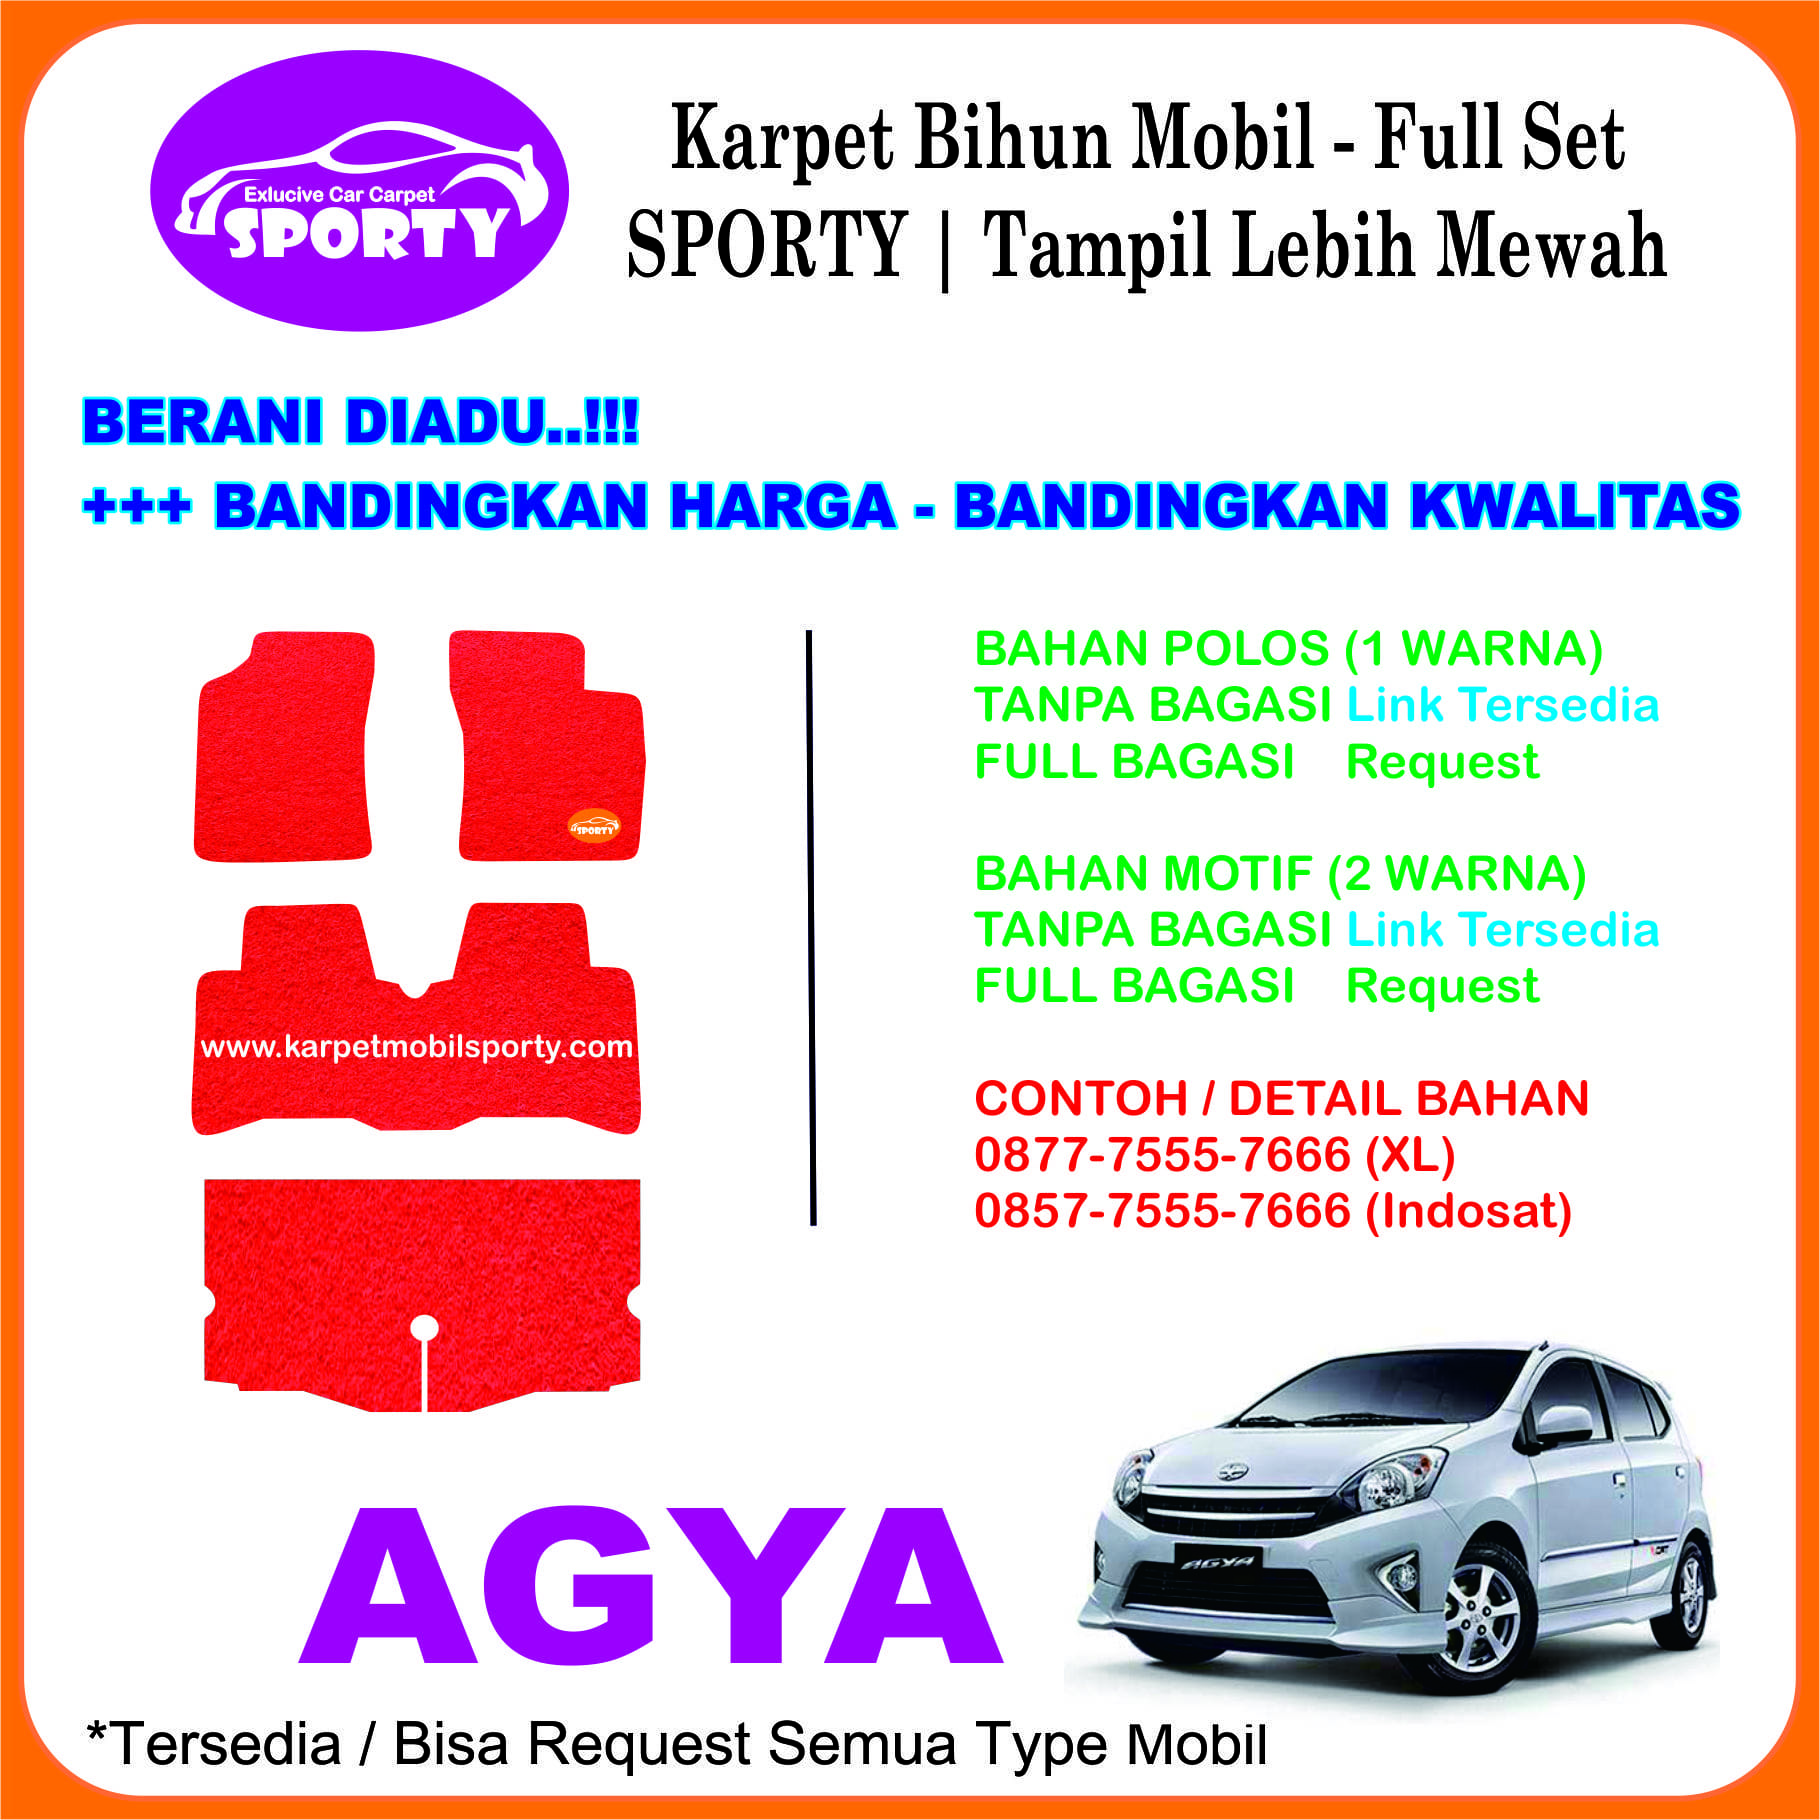 Karpet Mobil Mie Bihun AGYA Non Bagasi